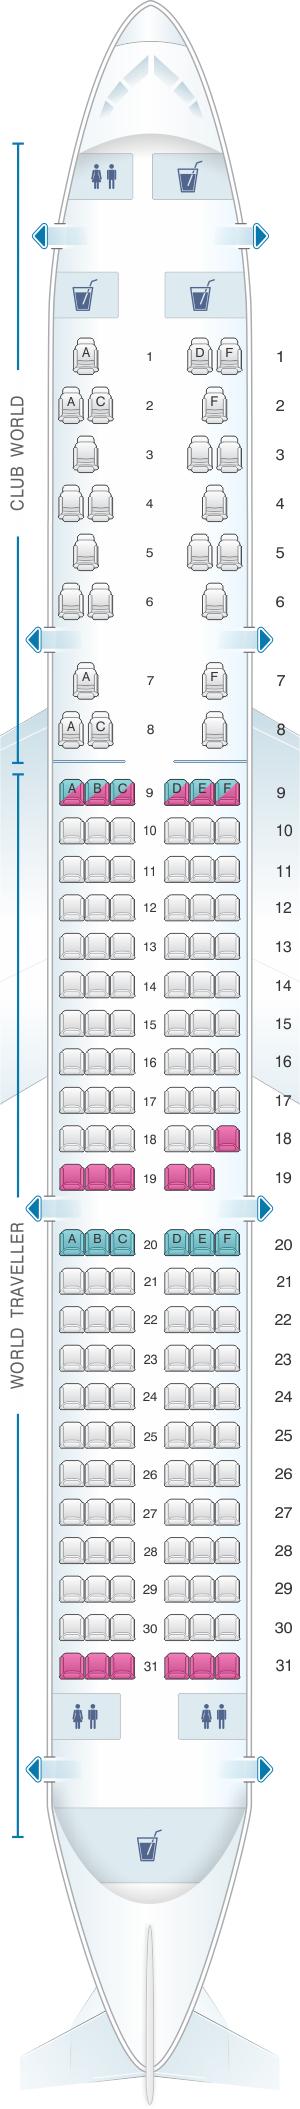 Seat map for British Airways Airbus A321 Worldwide